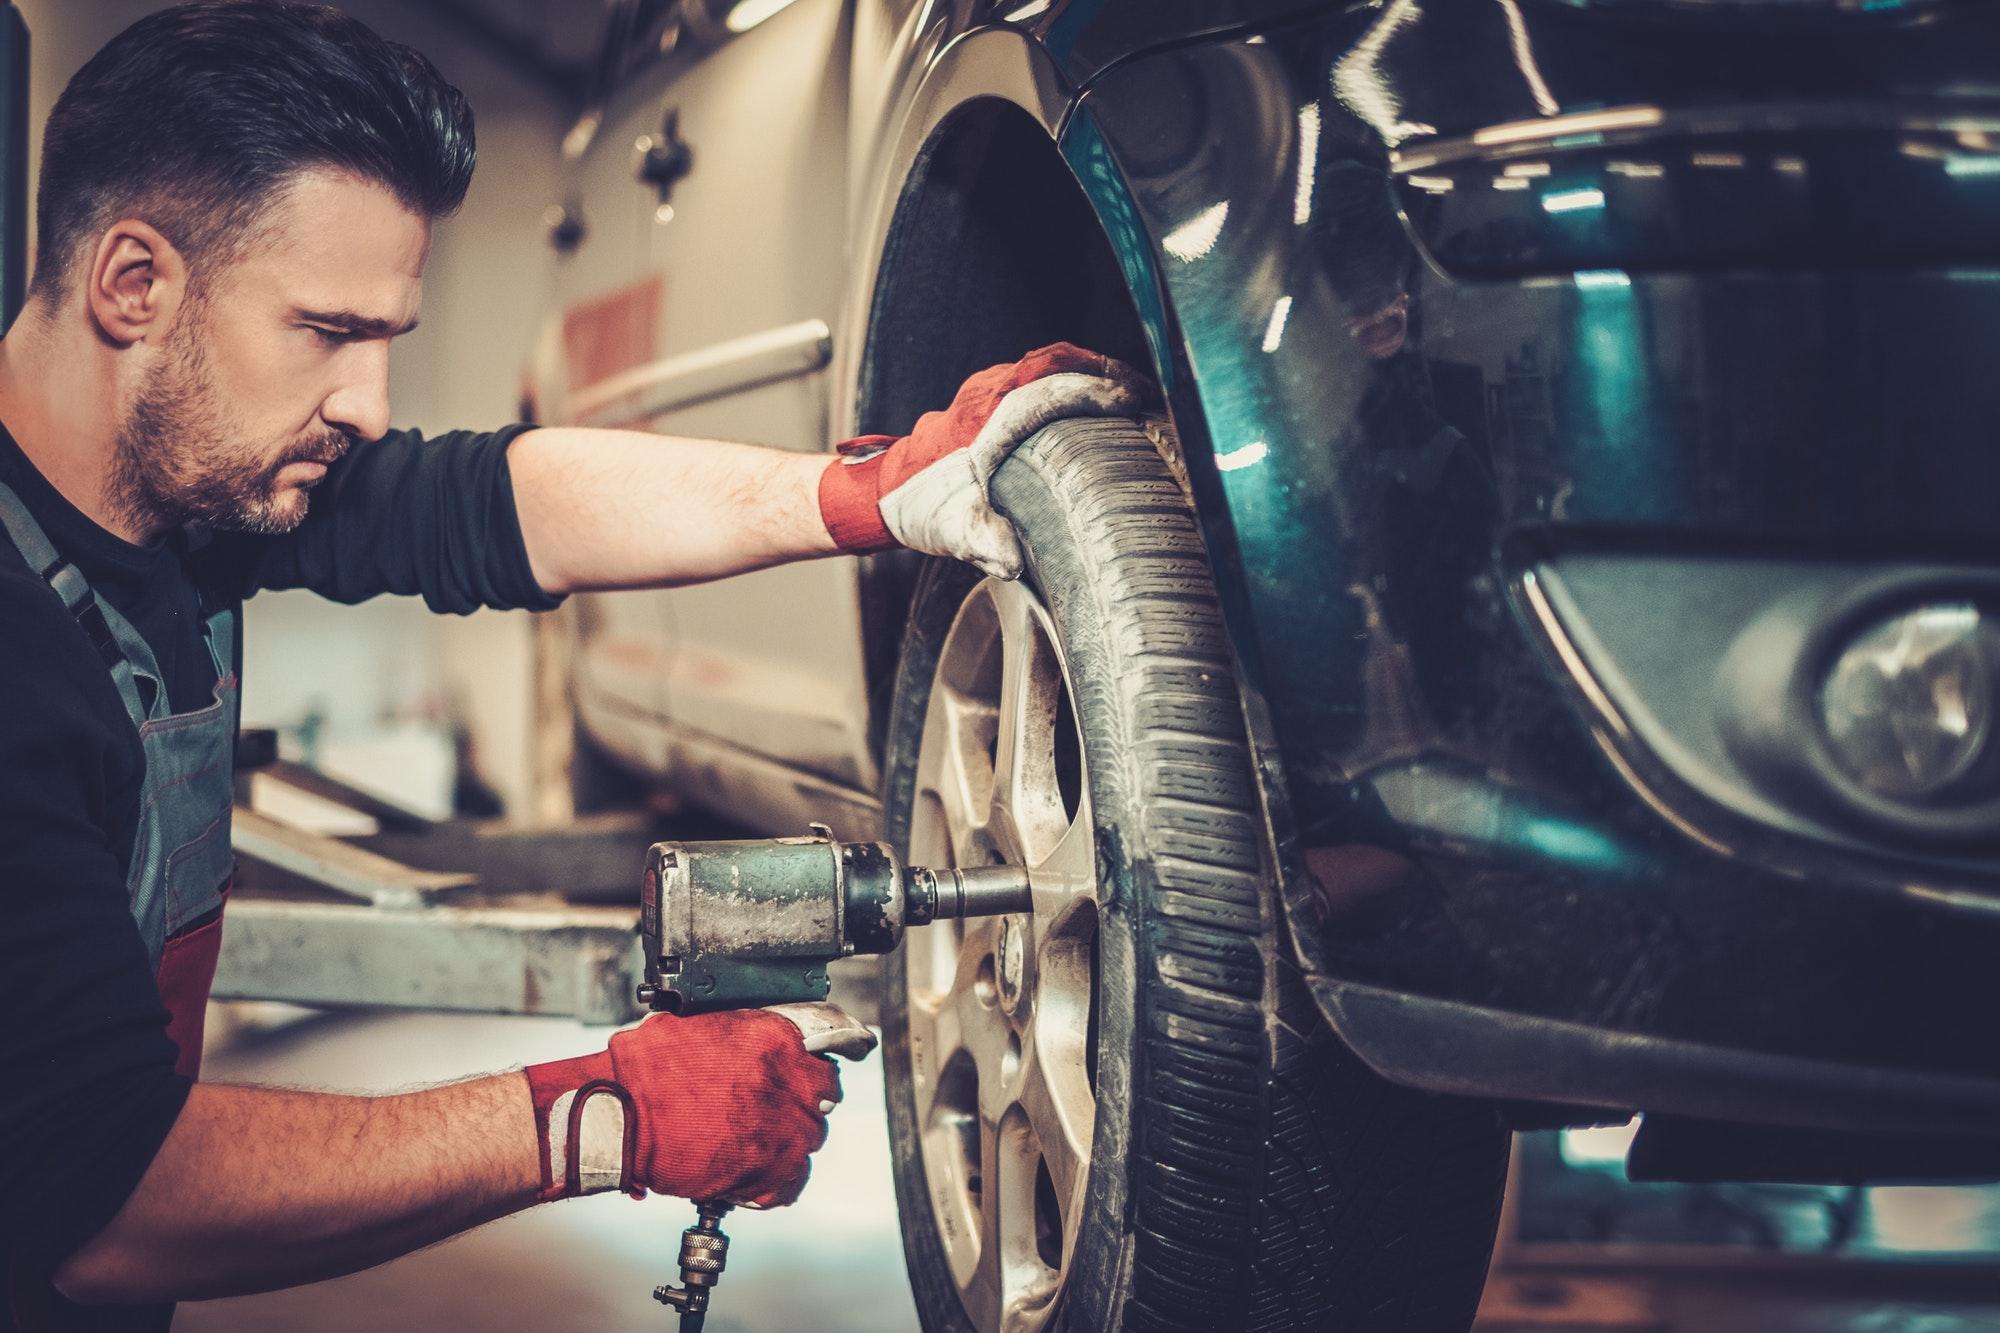 Professional car mechanic changing car wheel in auto repair service.